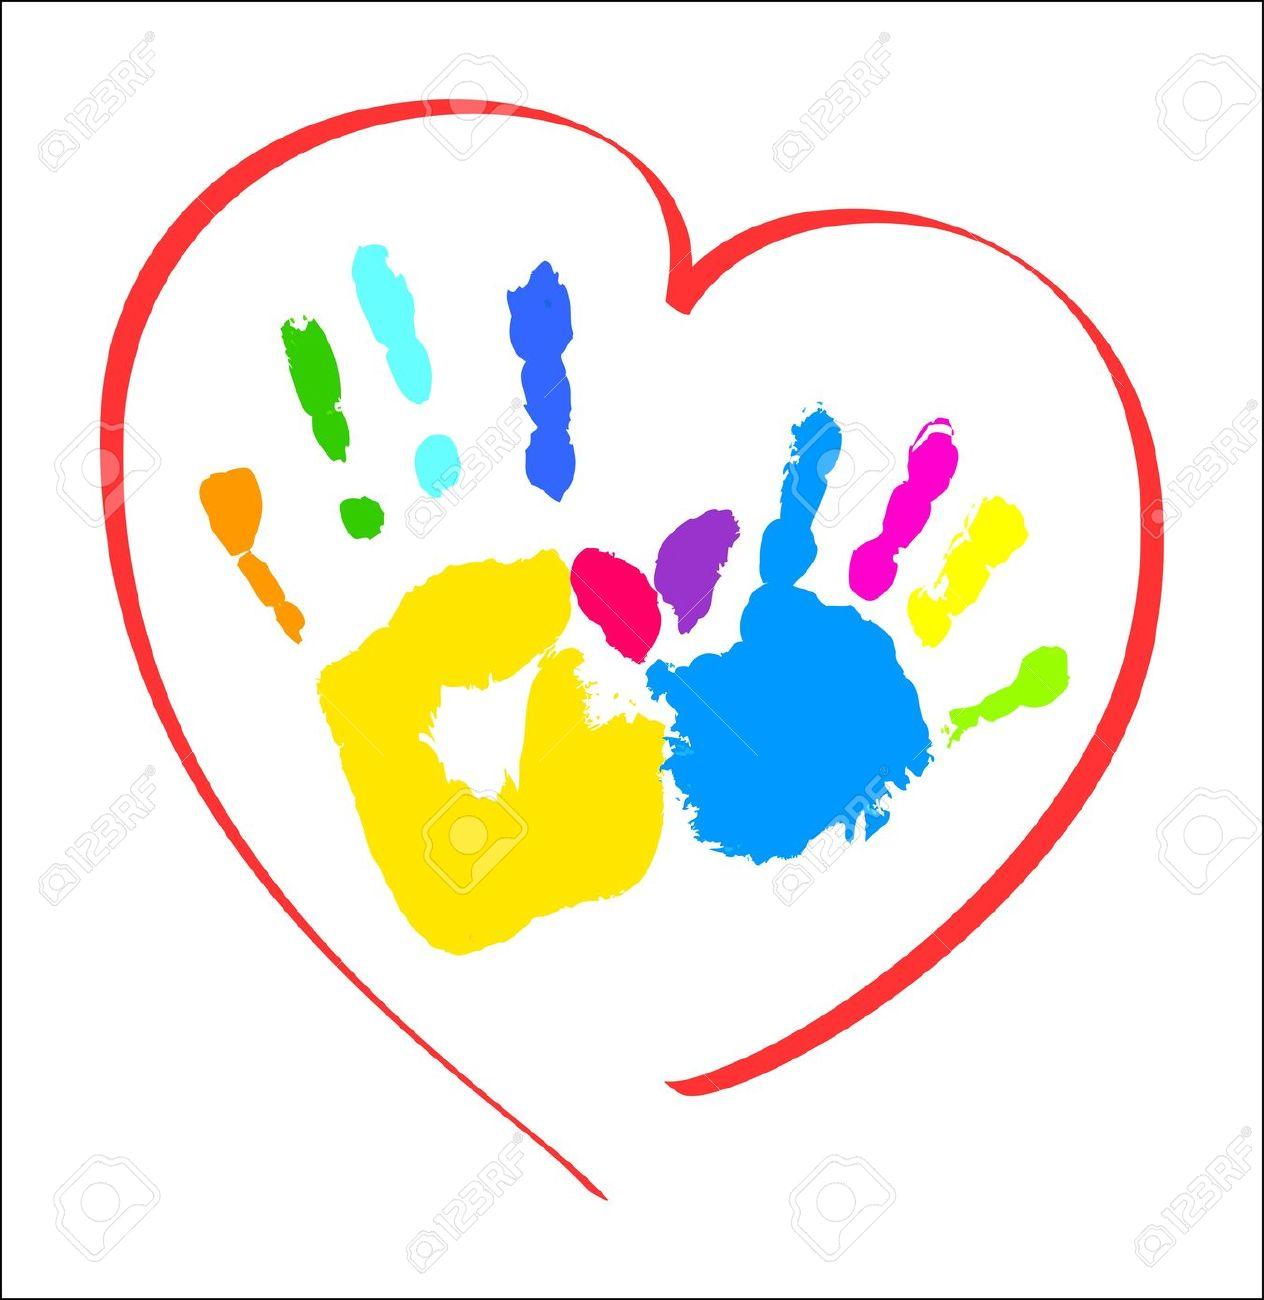 1264x1300 Handprint Clipart Childcare Cute Borders, Vectors, Animated, Black